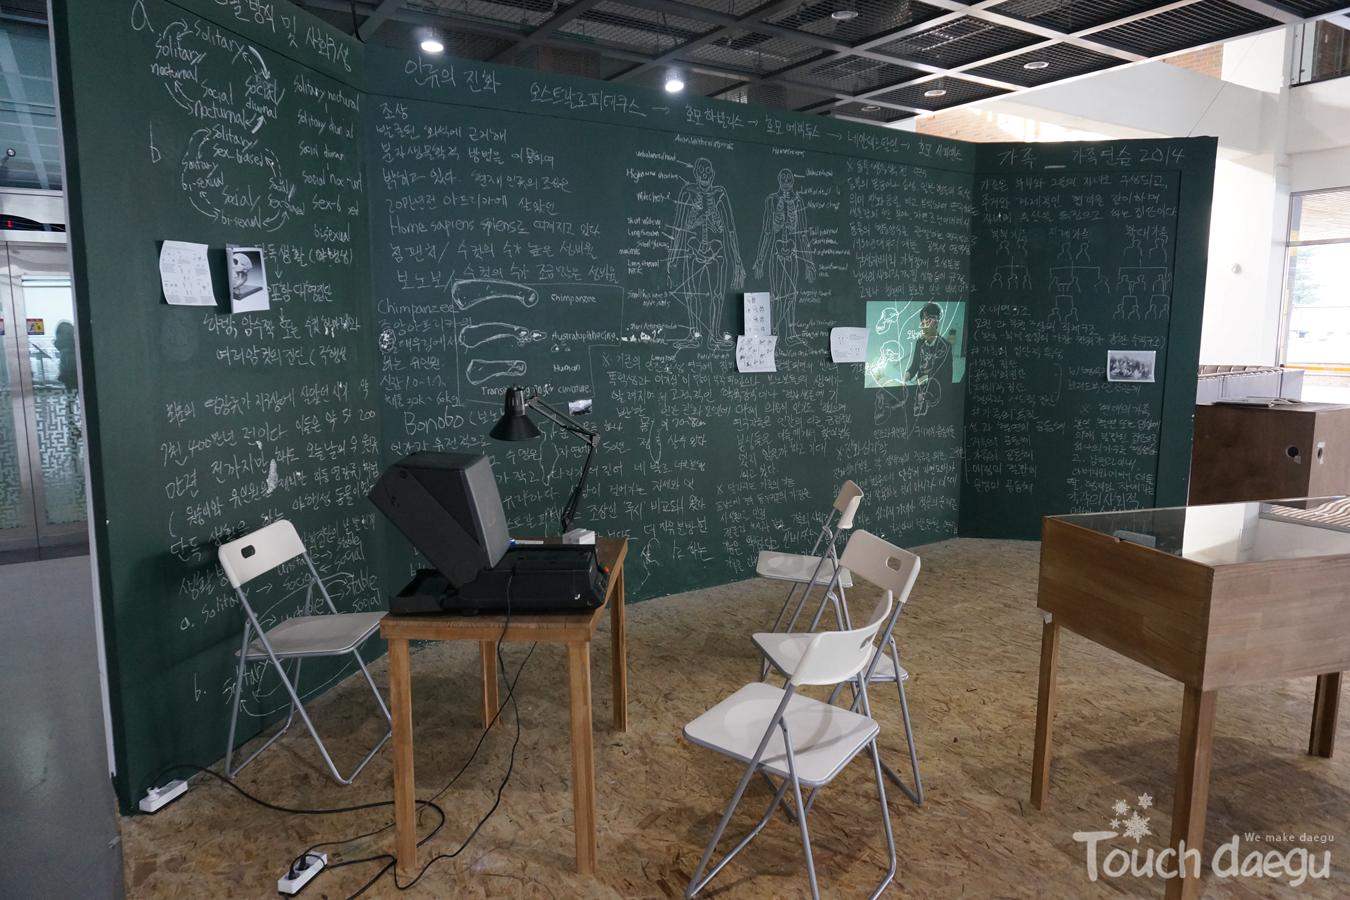 An installation artwork of Yoo Mok-yon in the lobby of Daegu Art Factory